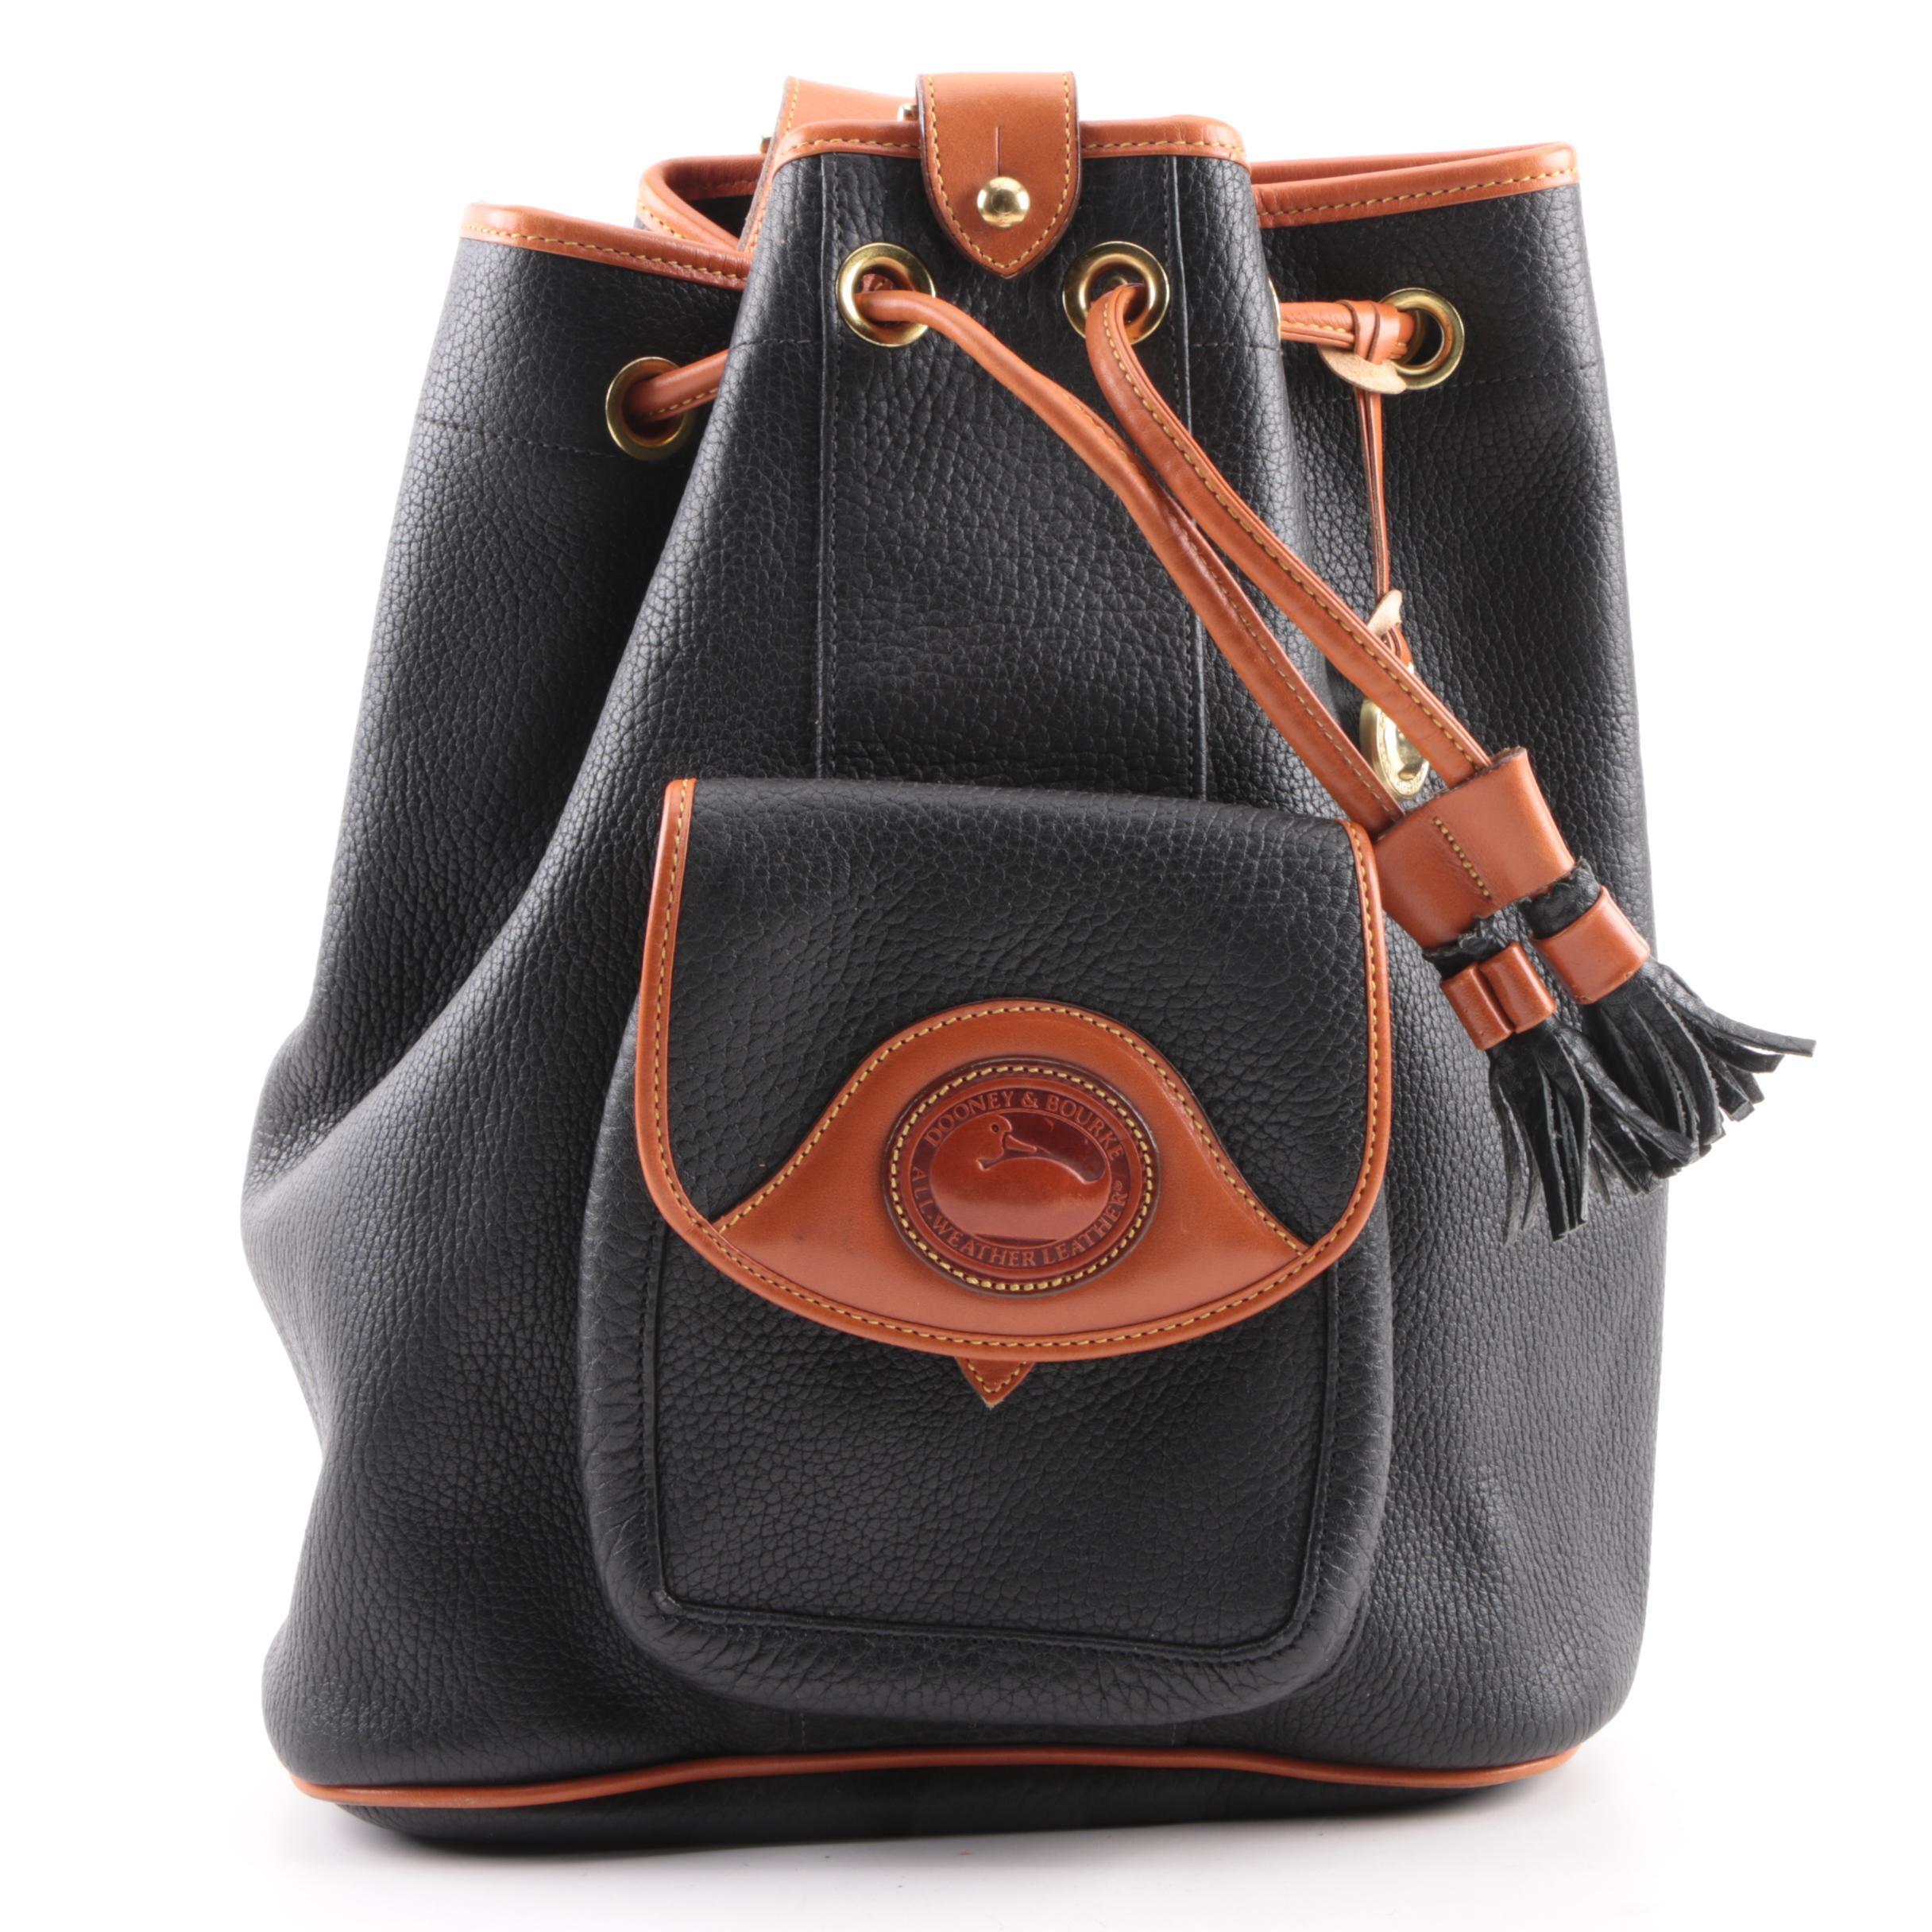 Dooney & Bourke All-Weather Leather Bucket Bag